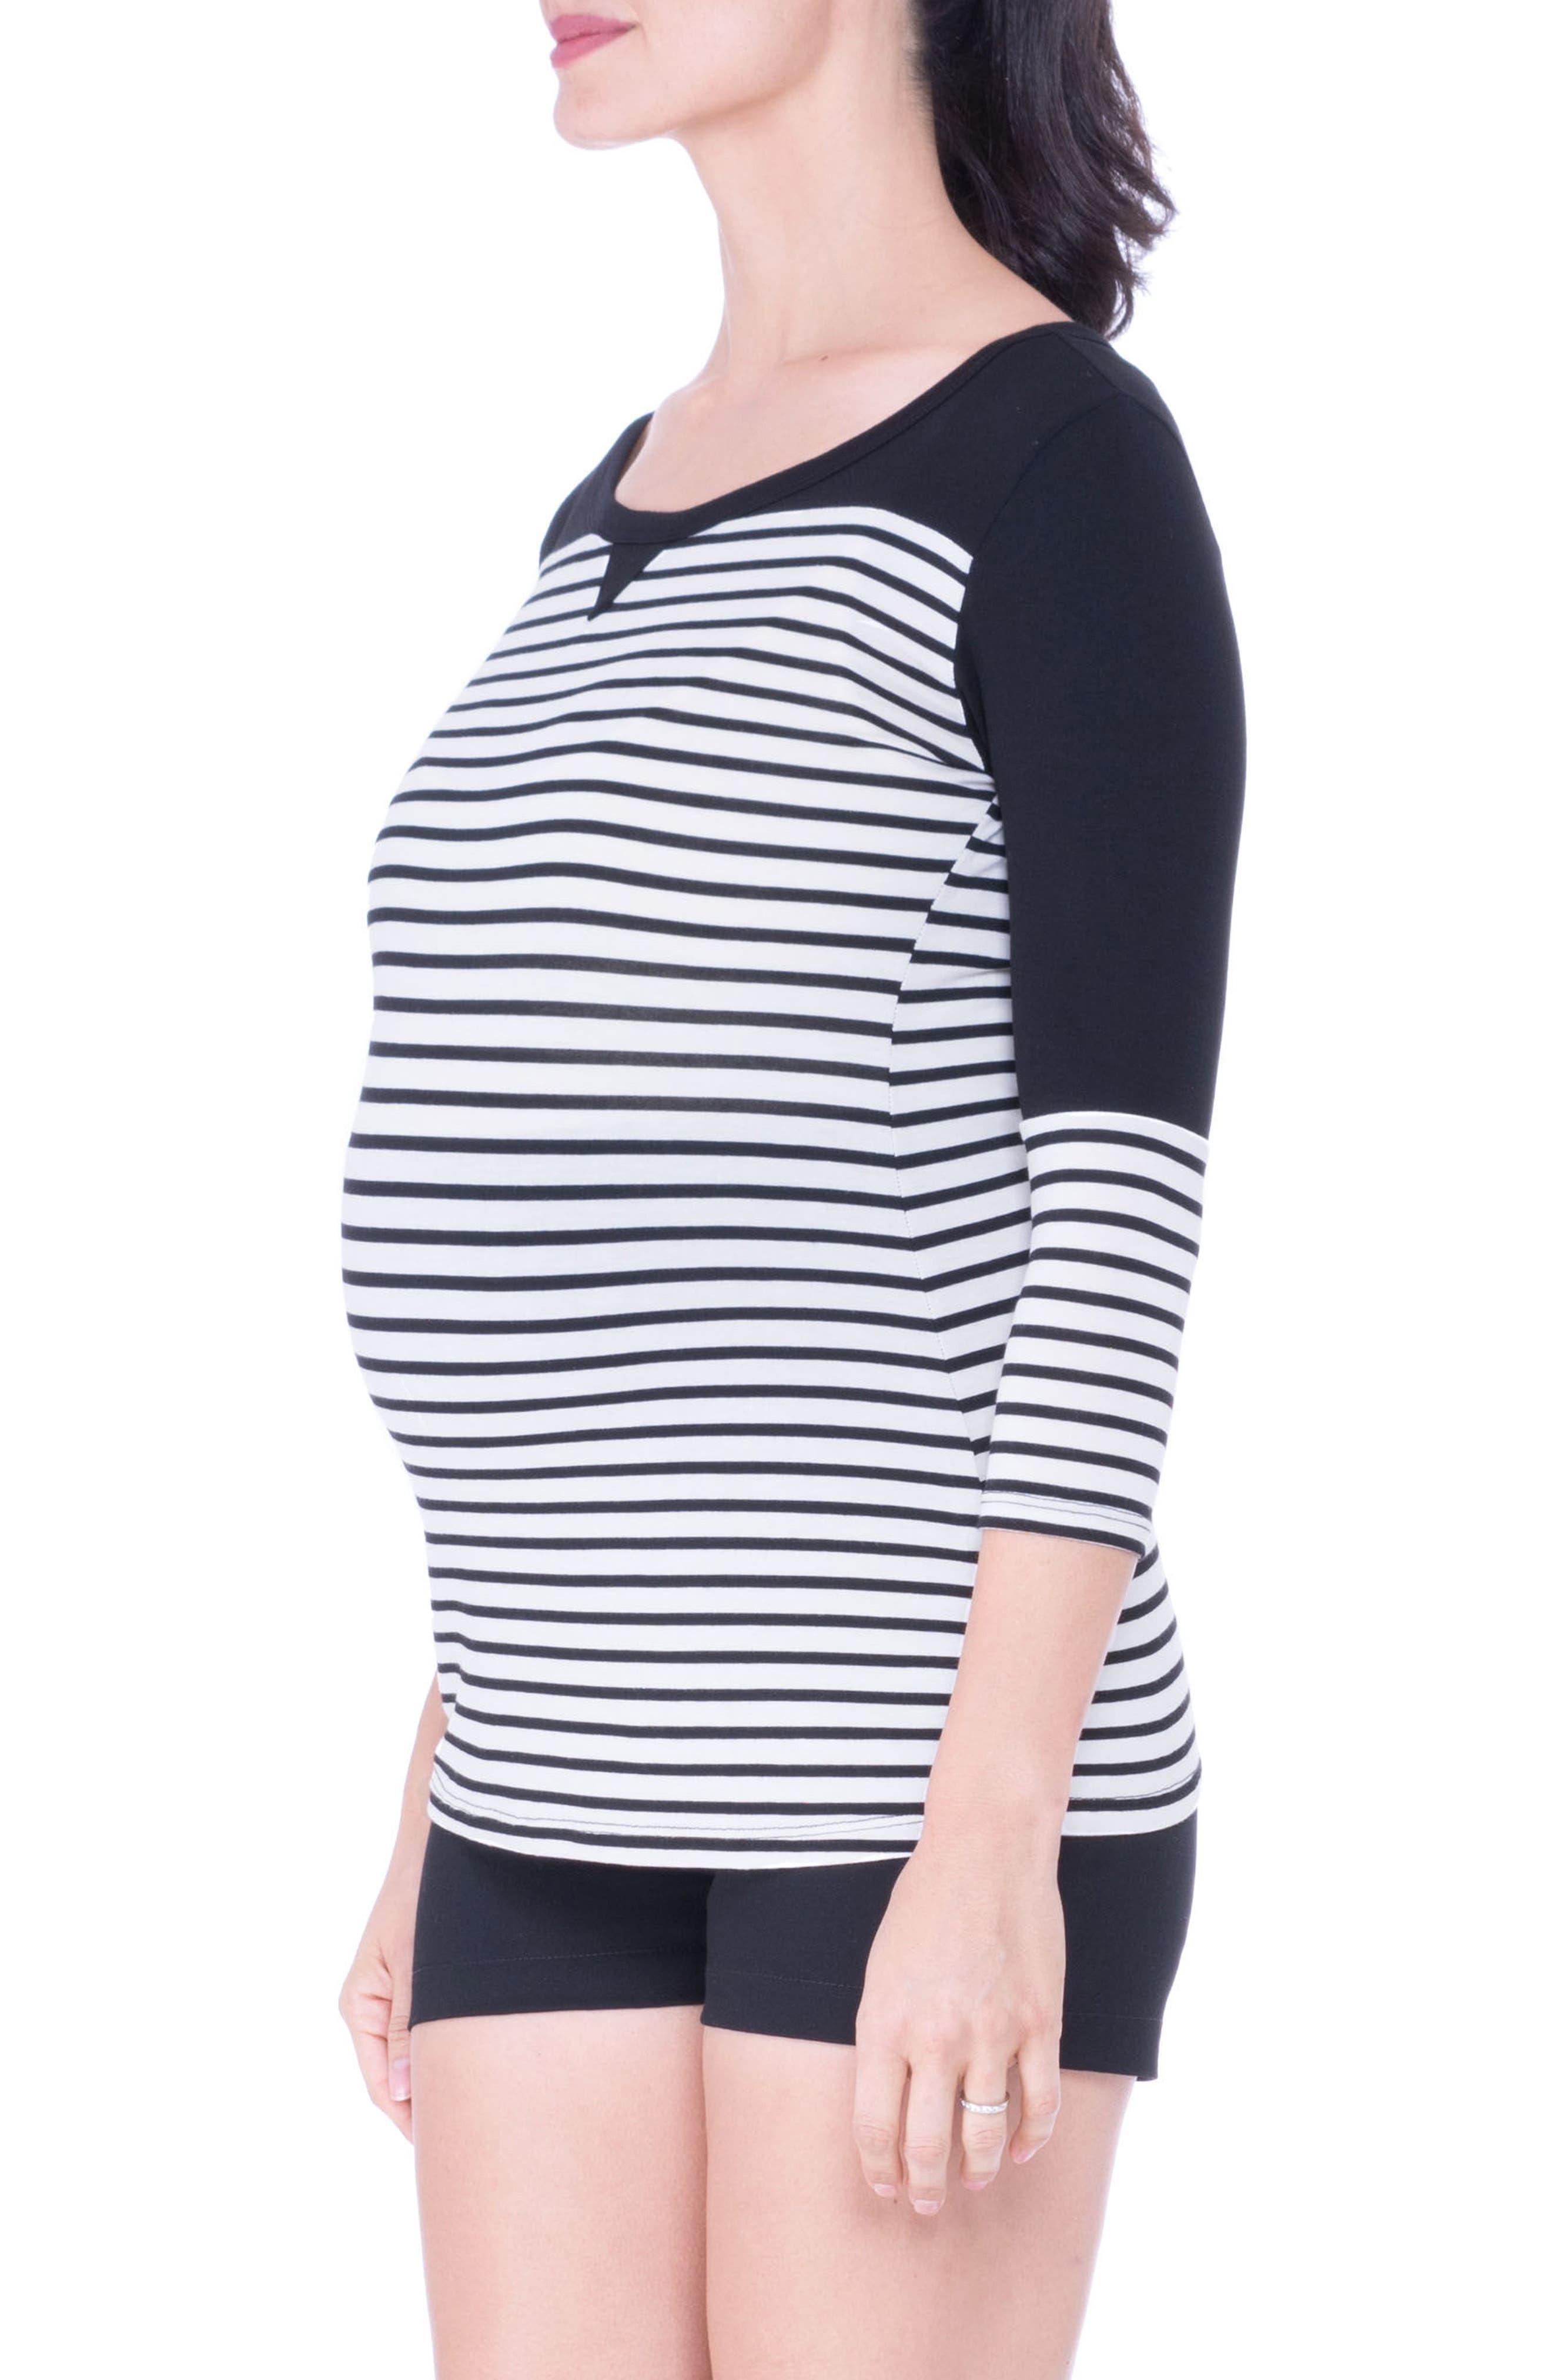 Alternate Image 1 Selected - Olian Stripe Maternity Tee